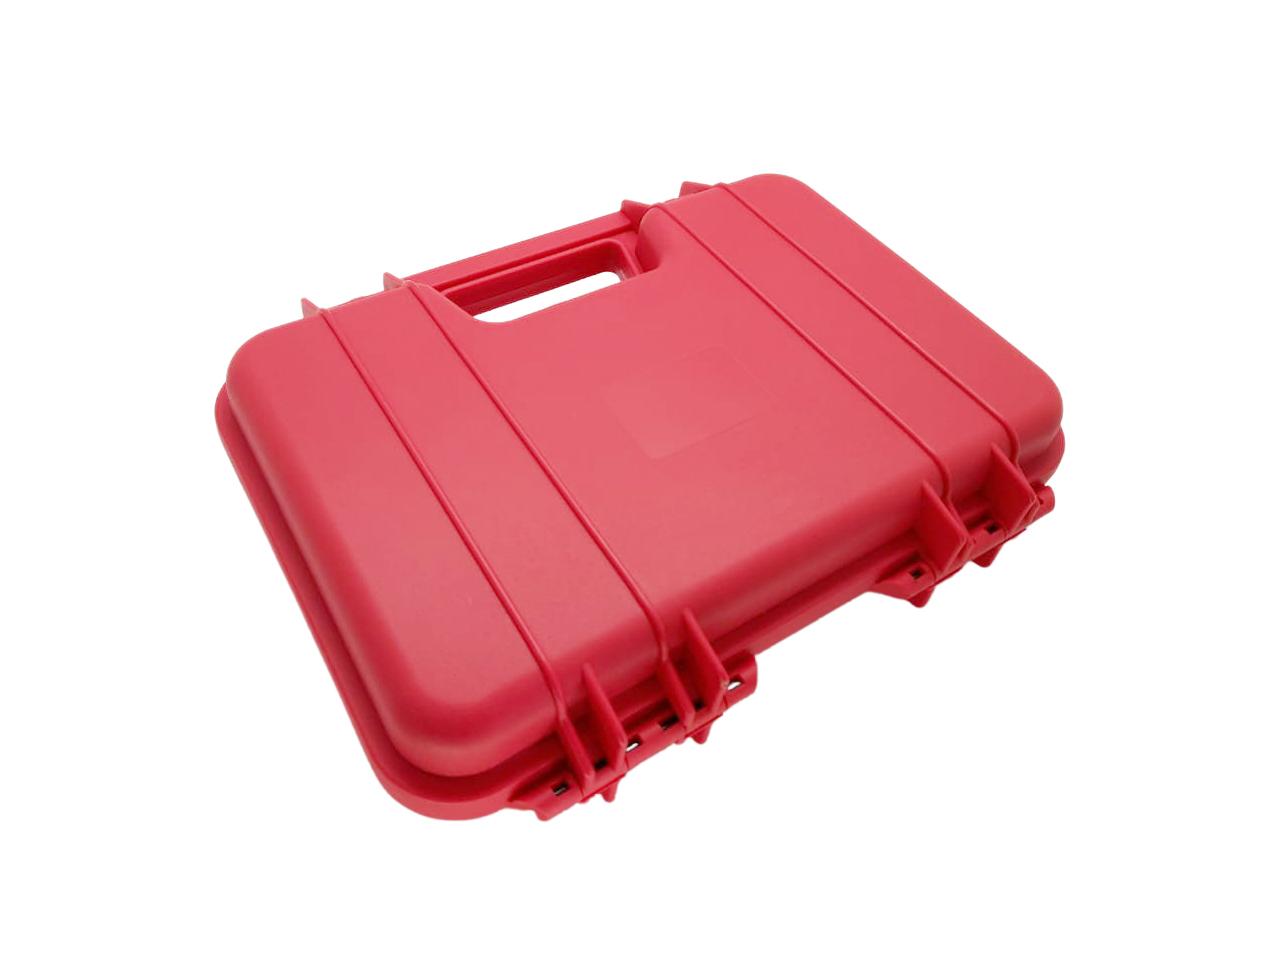 Maleta Plástica para Pistola - Cor: Vermelha  - MAB AIRSOFT